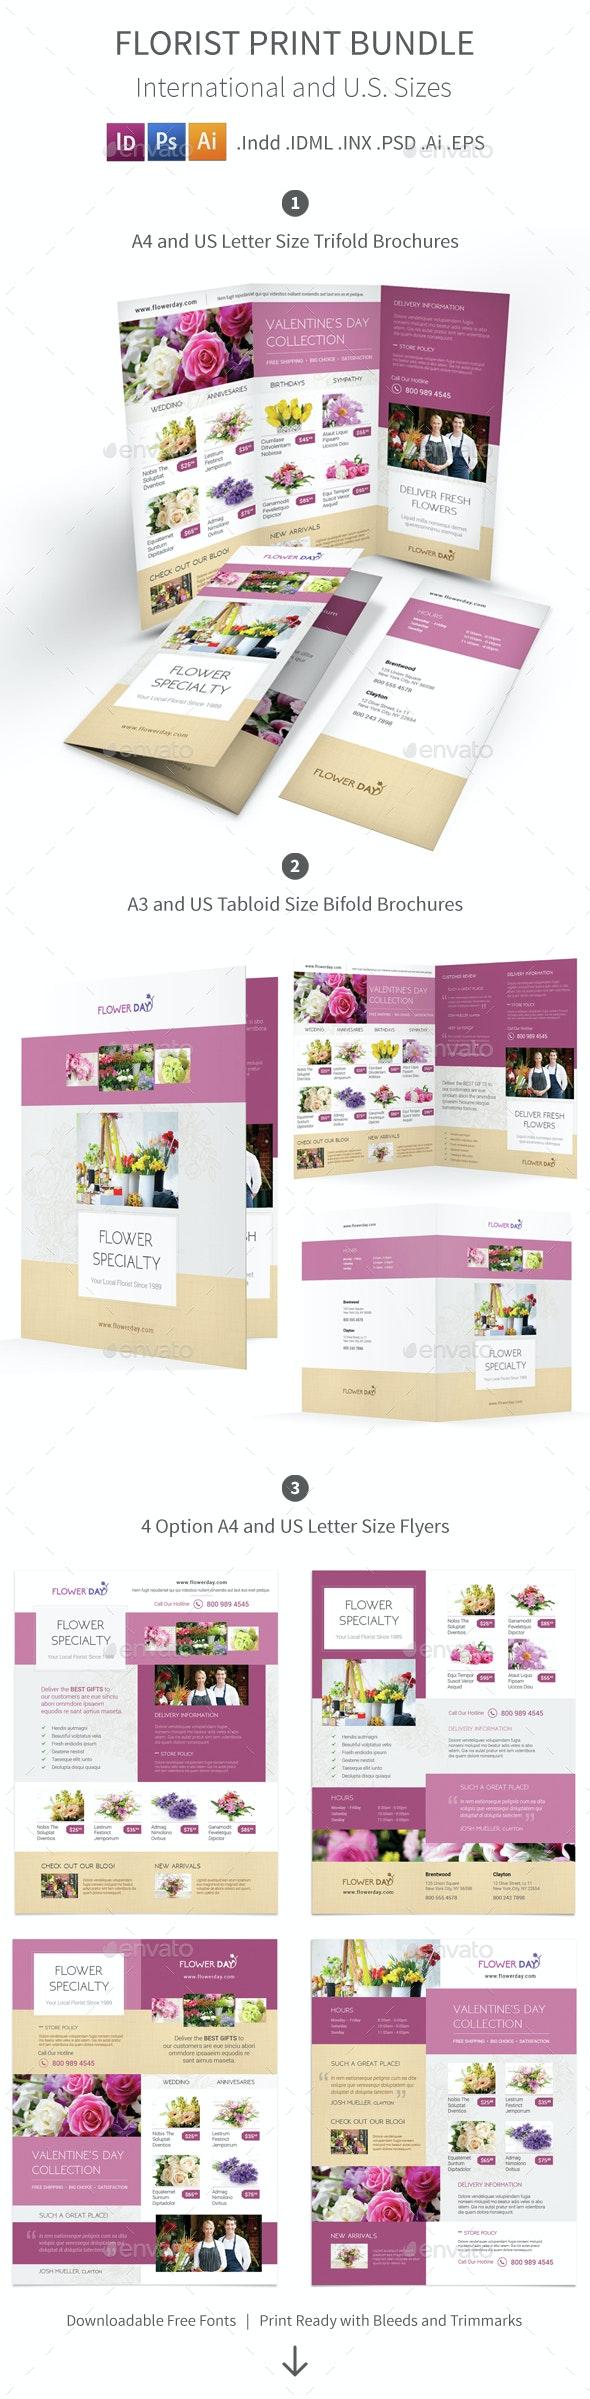 Florist Print Bundle 2 - Informational Brochures